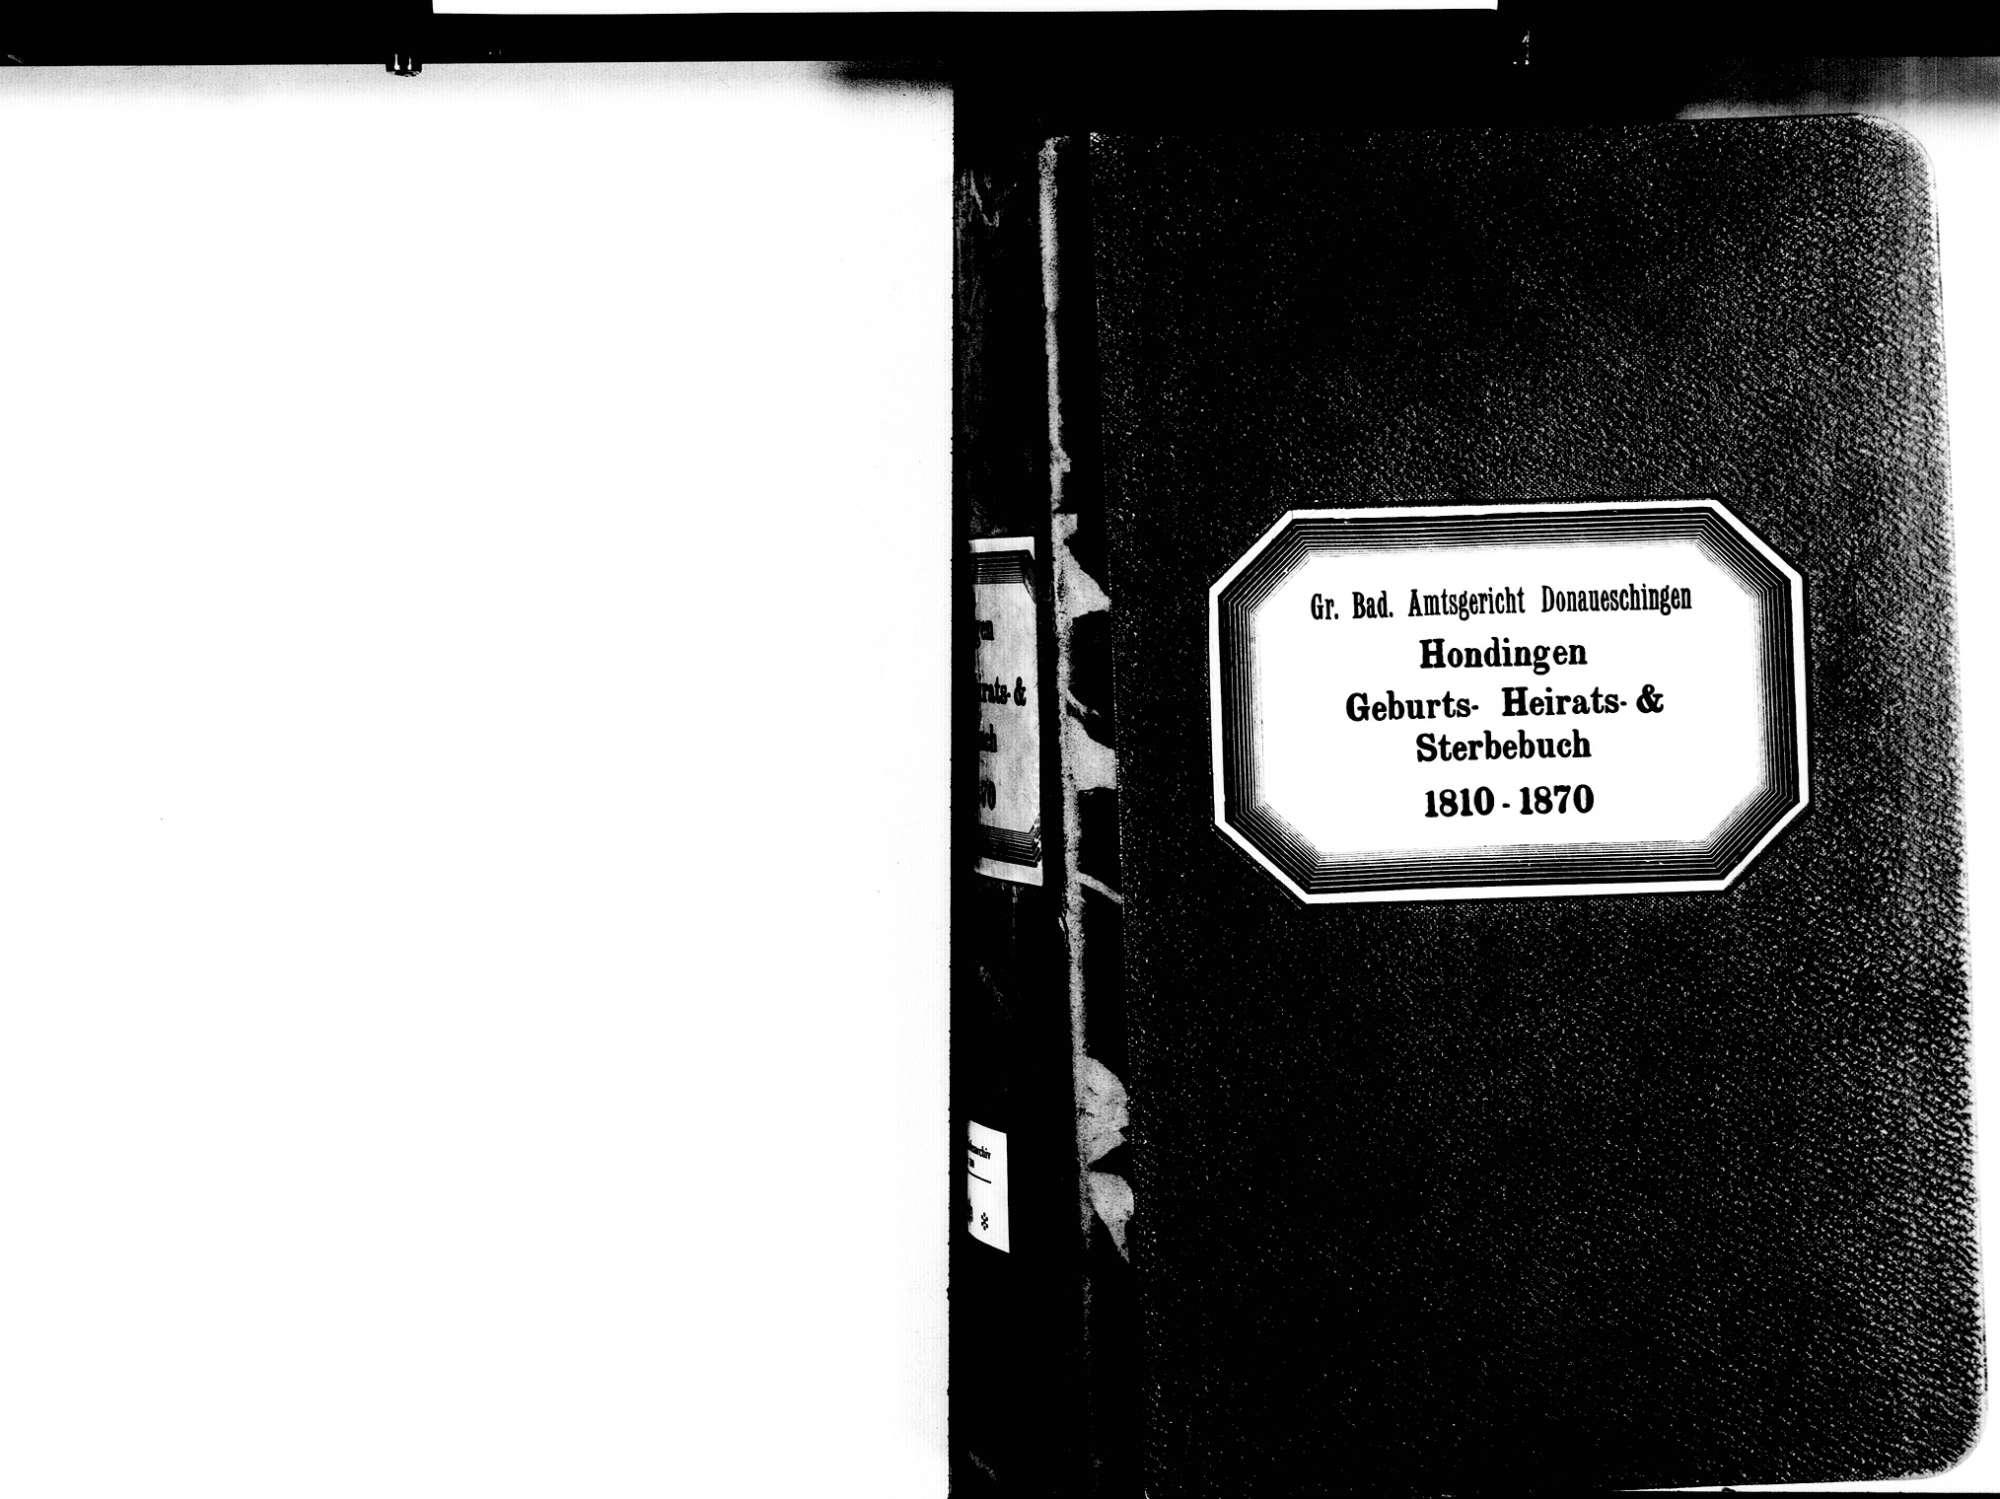 Hondingen, Blumberg VS; Katholische Gemeinde: Standesbuch 1810-1870, Bild 3